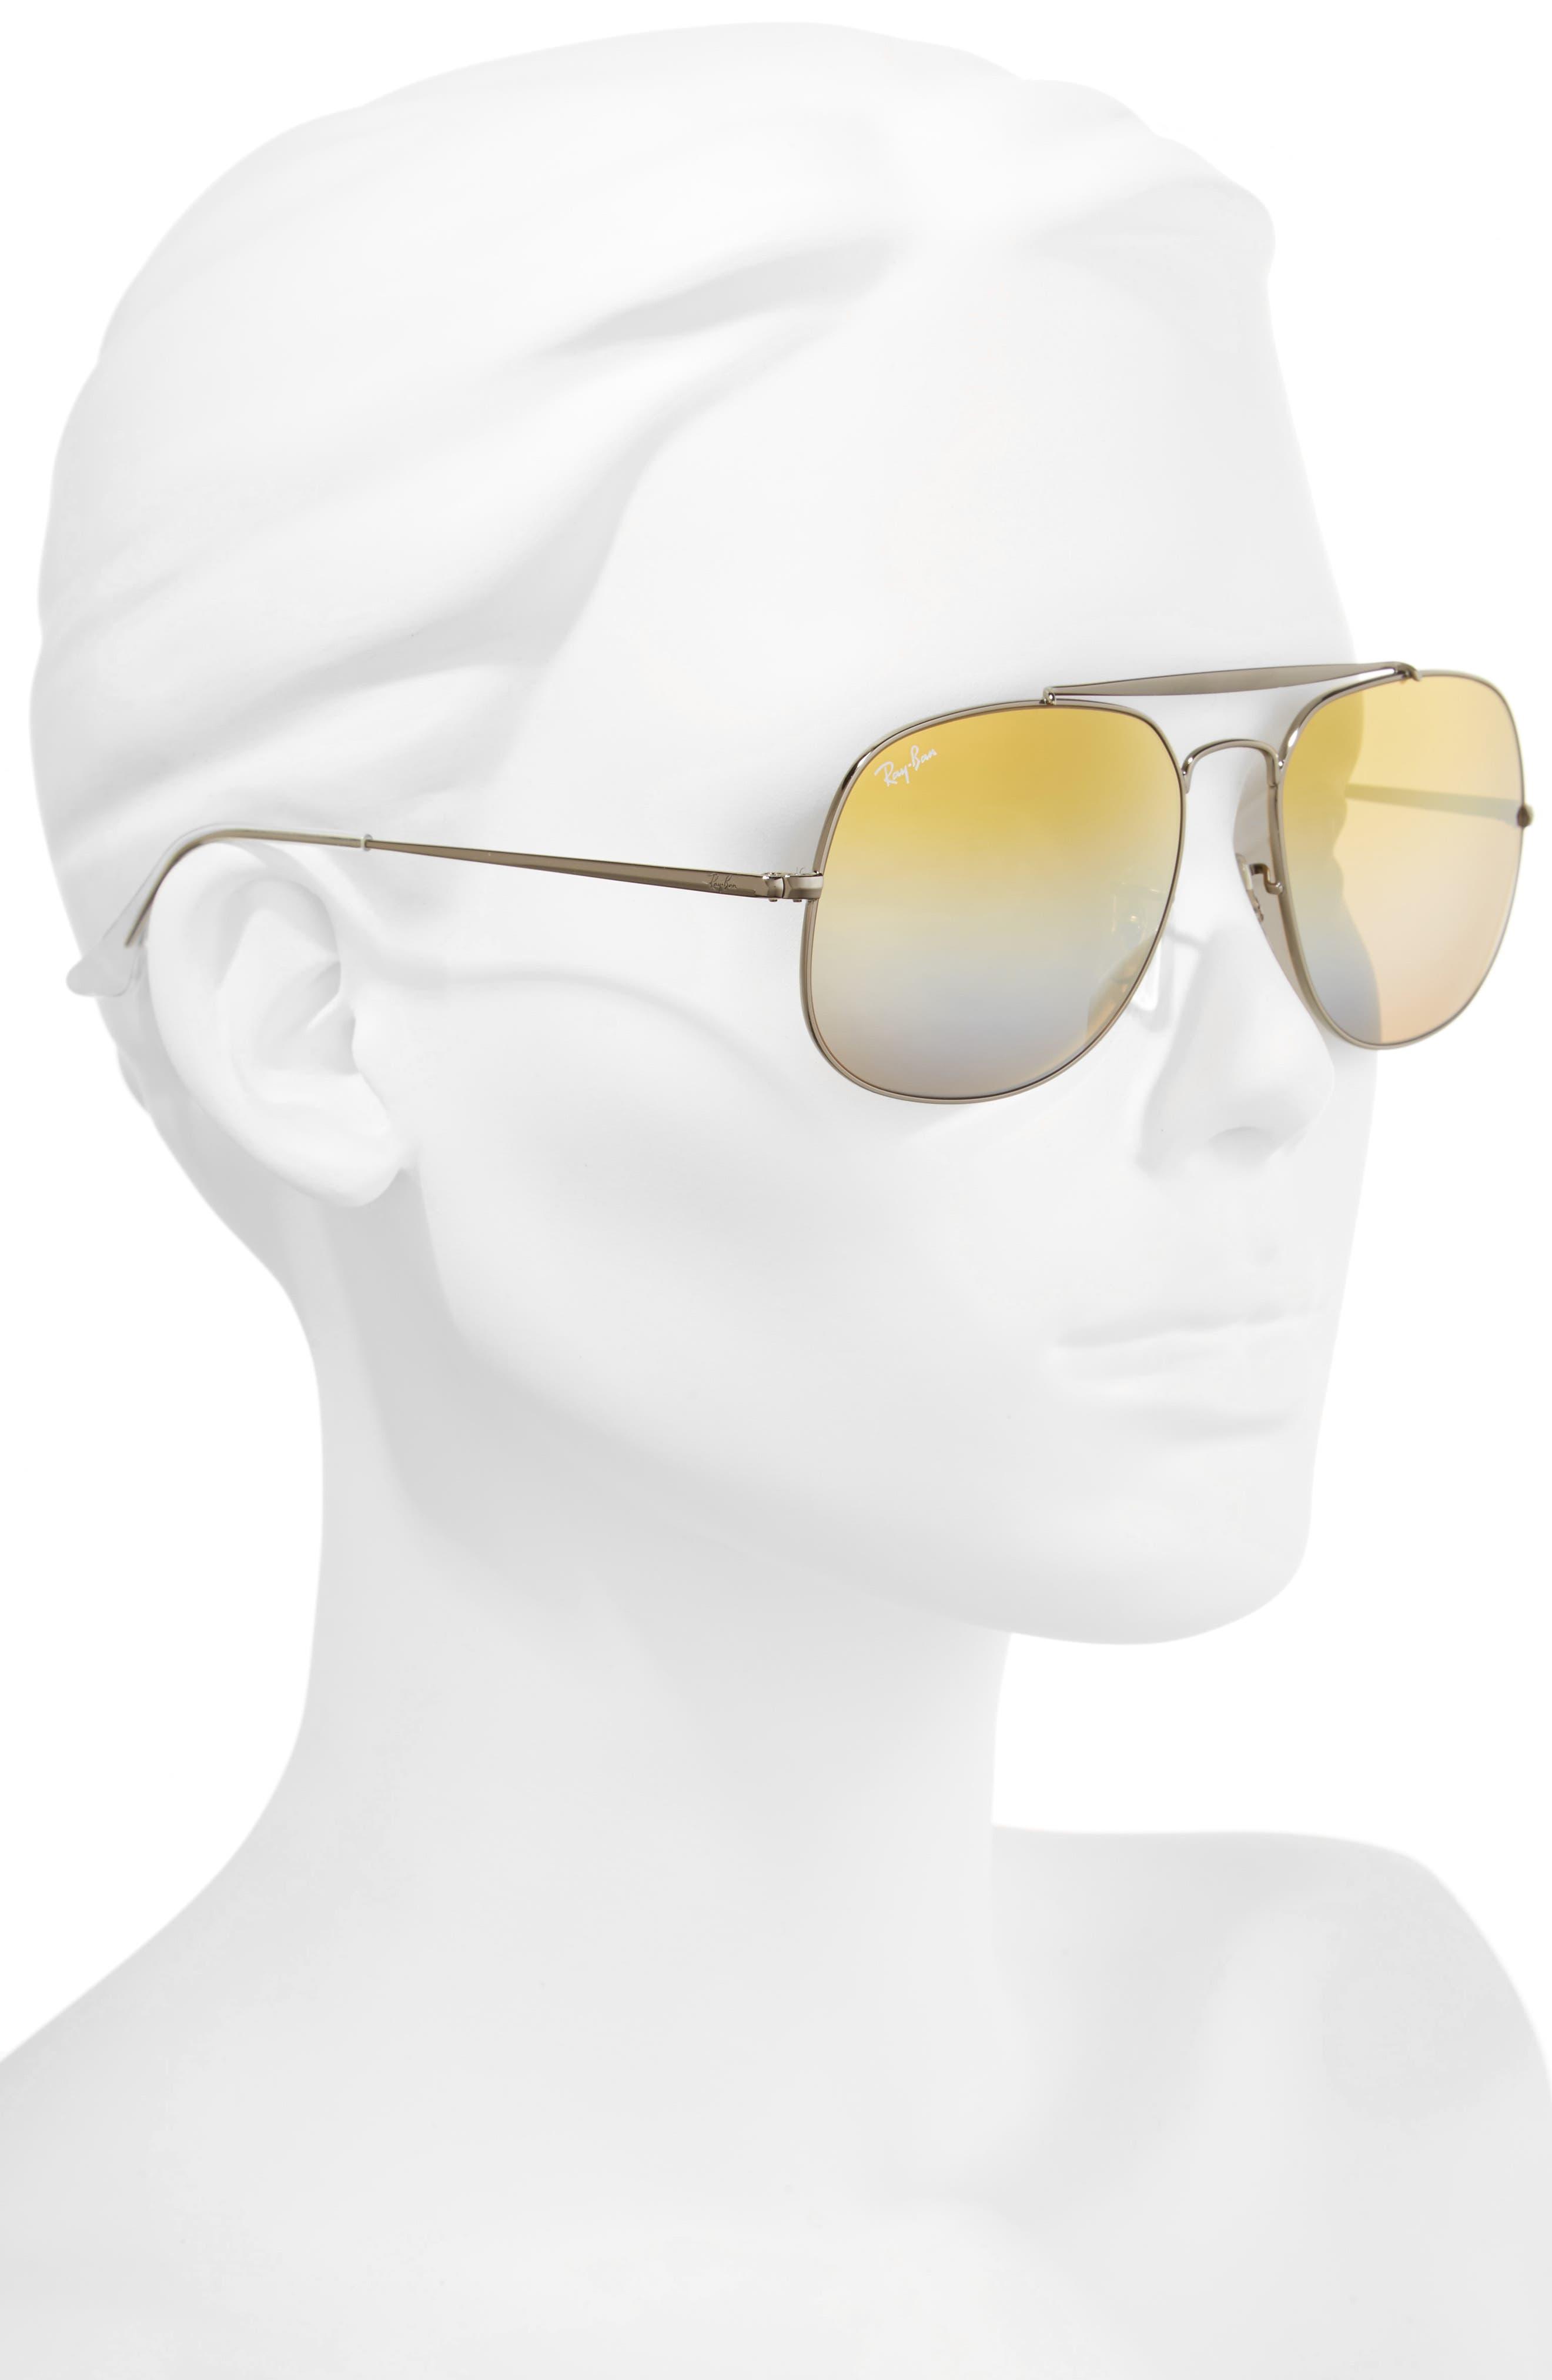 57mm Aviator Sunglasses,                             Alternate thumbnail 2, color,                             Grey Orange